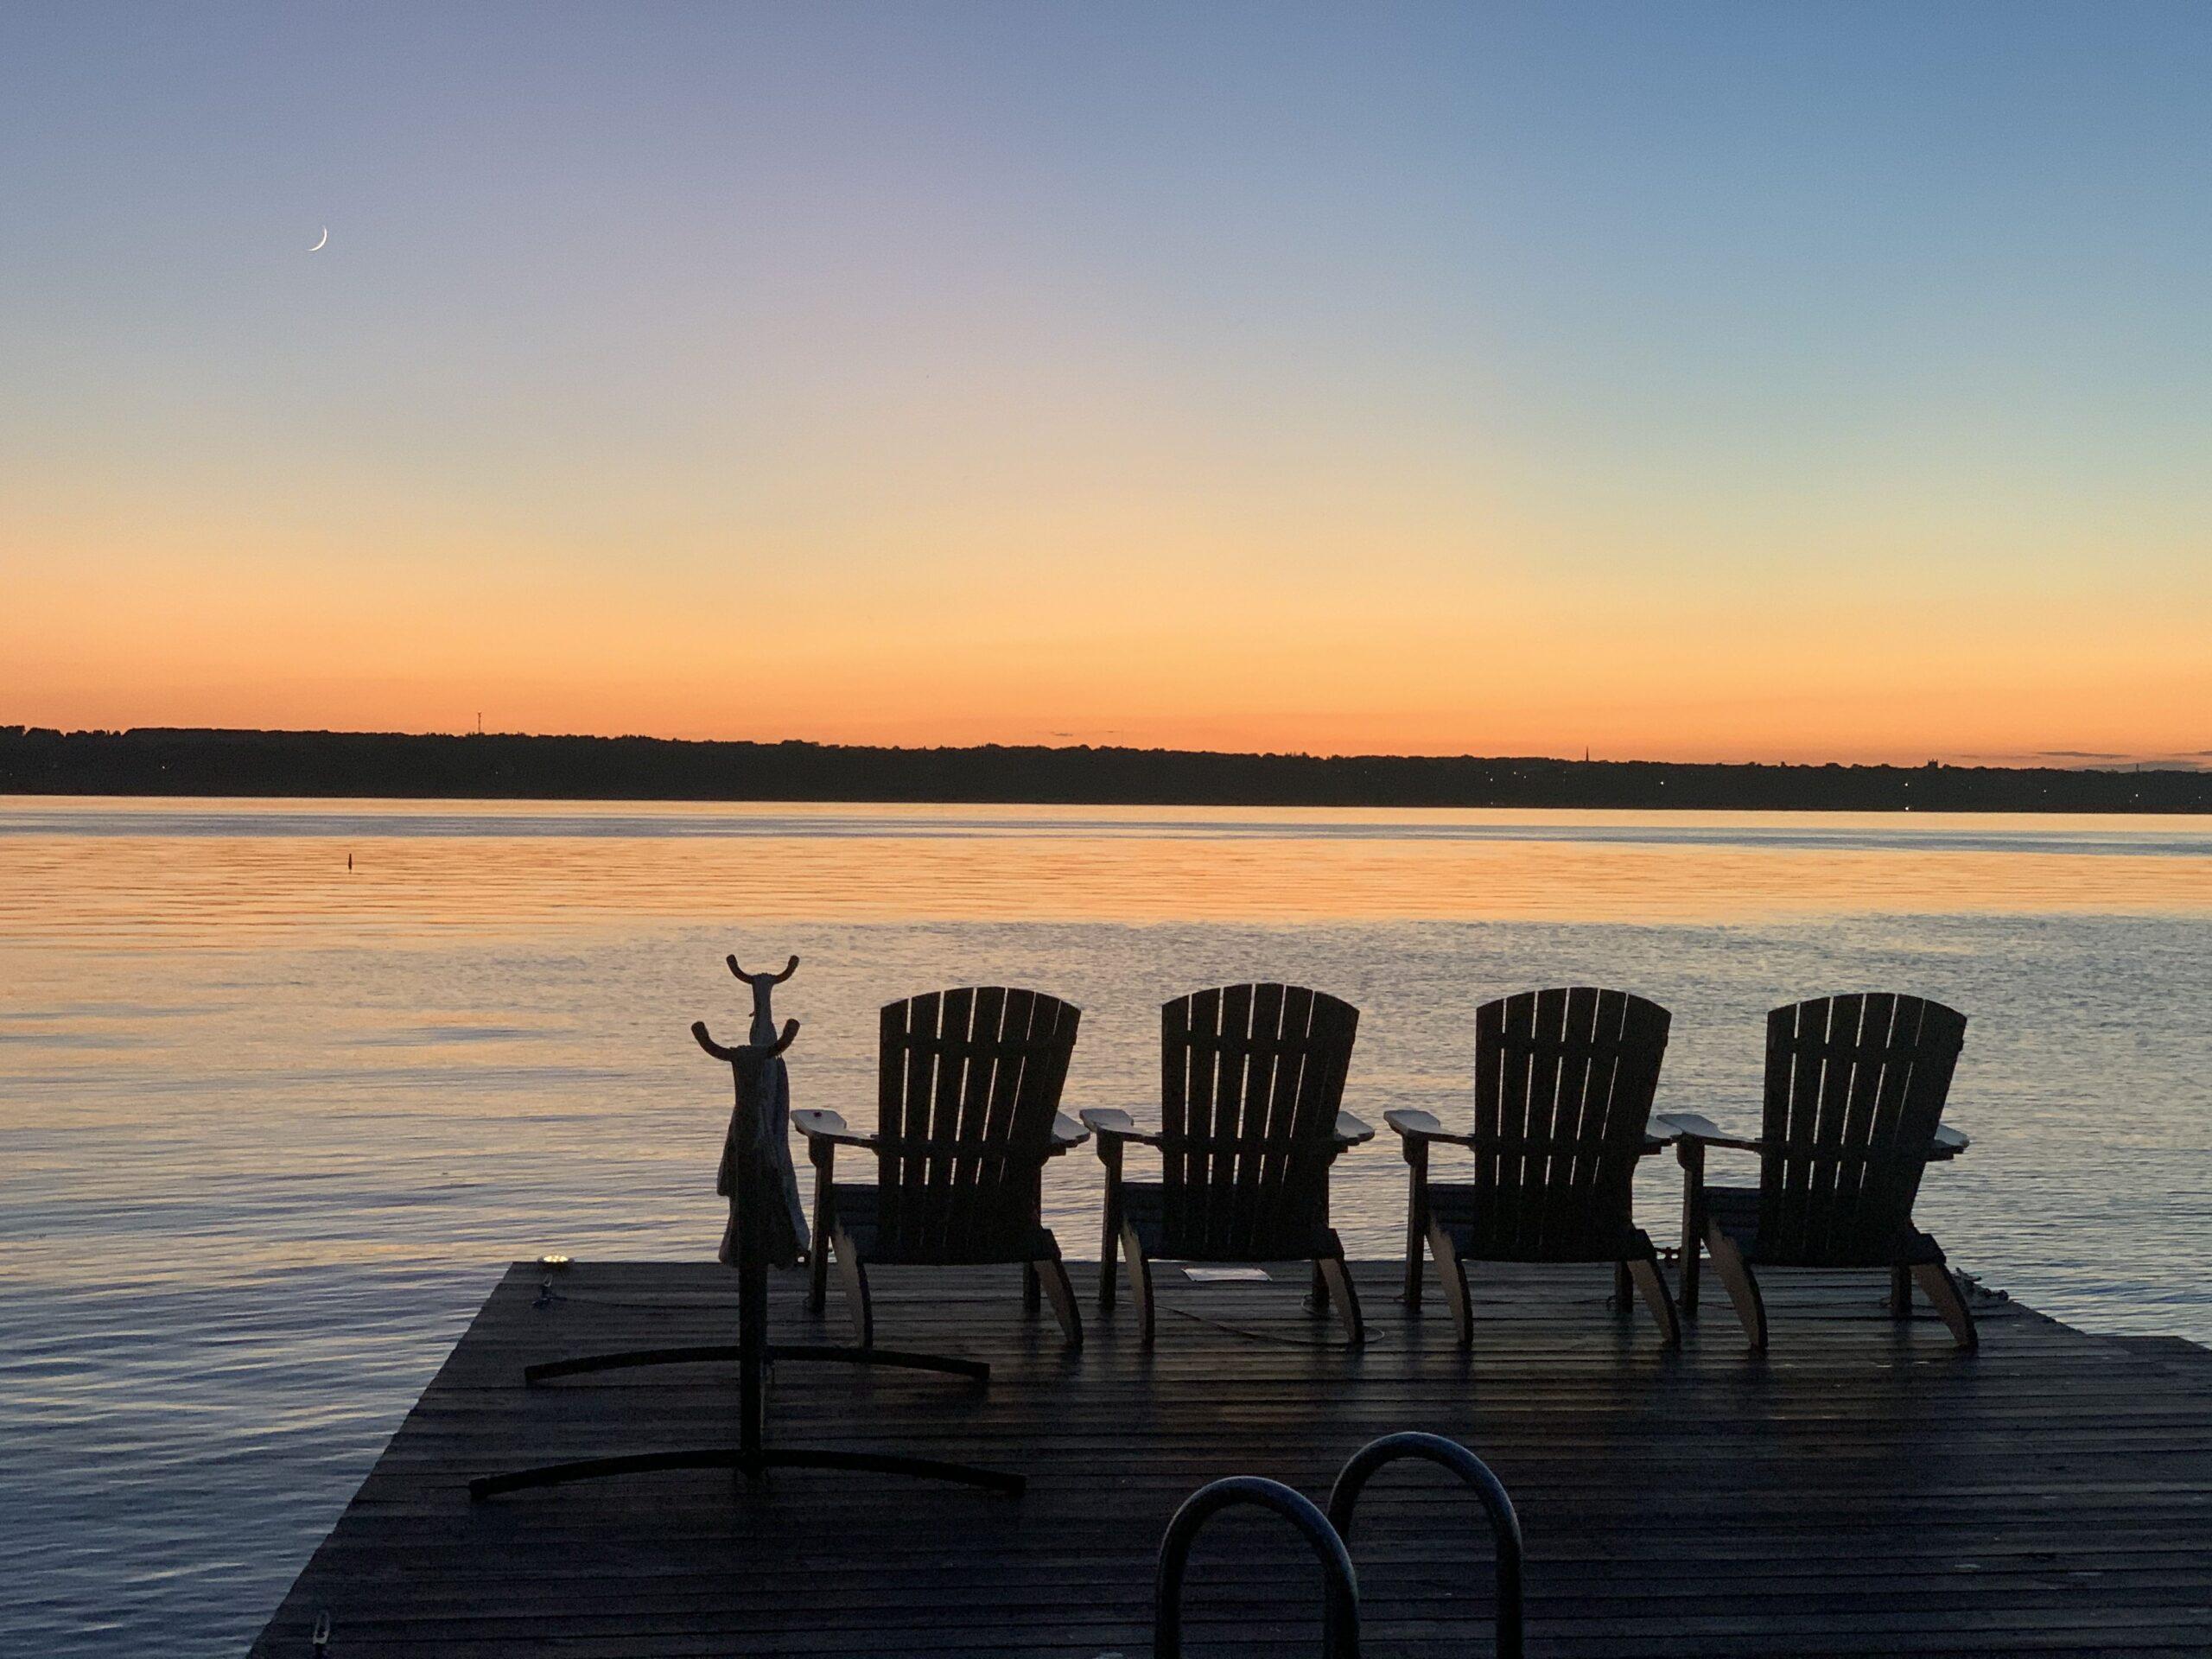 Sunset on Seneca Lake